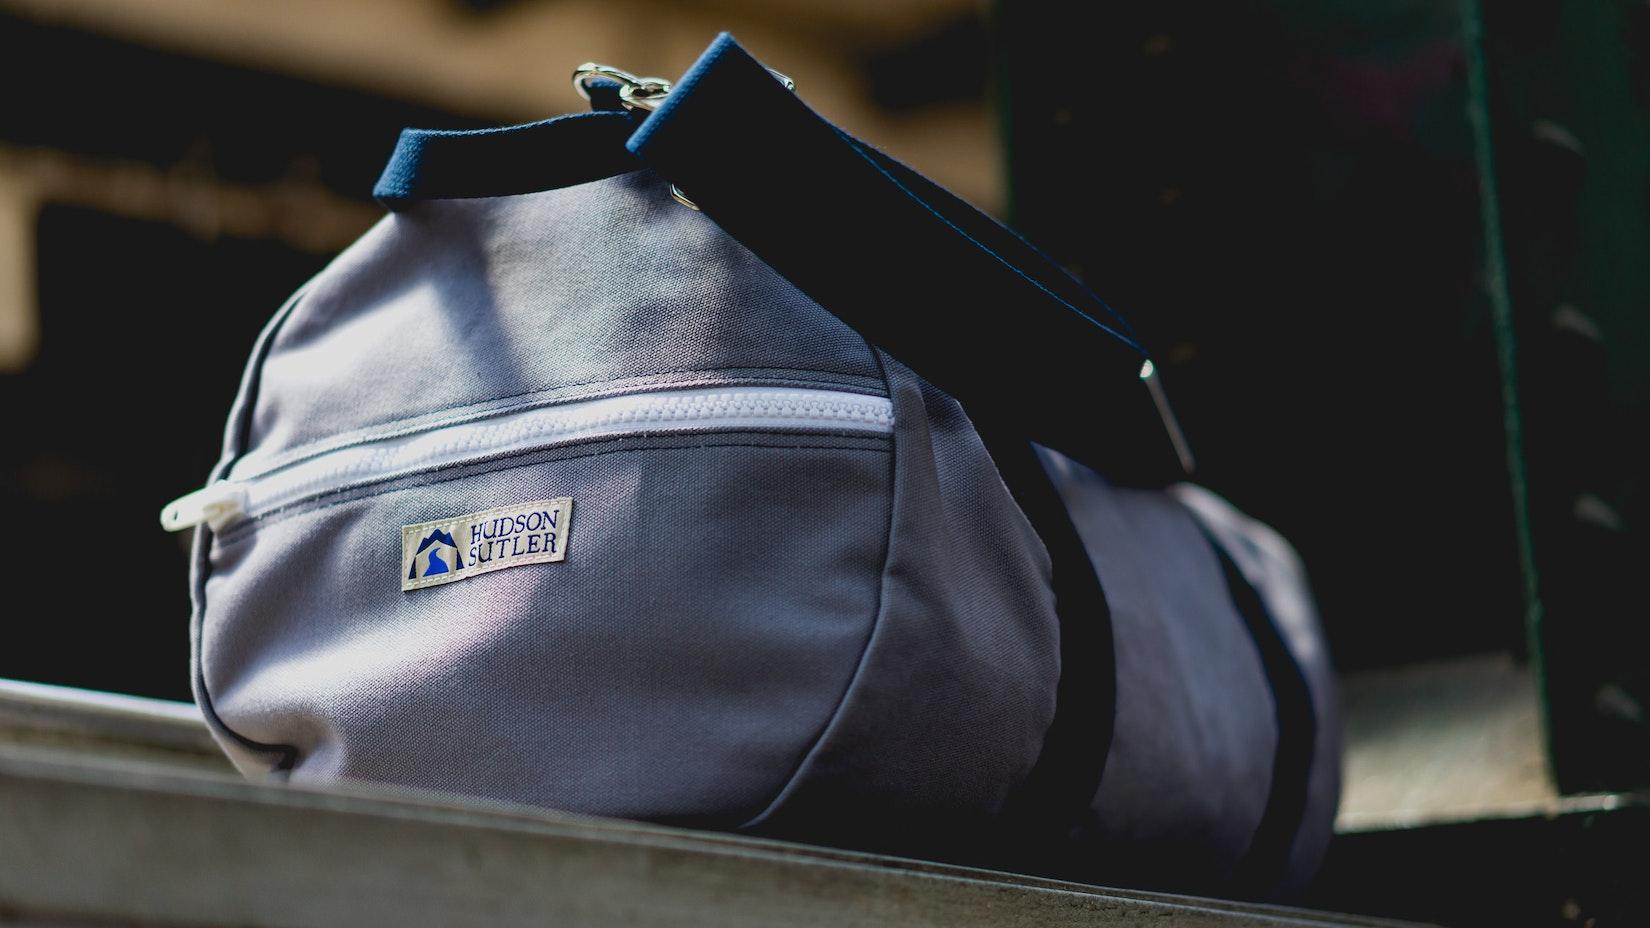 Hudson Sutler duffle bag at a train station